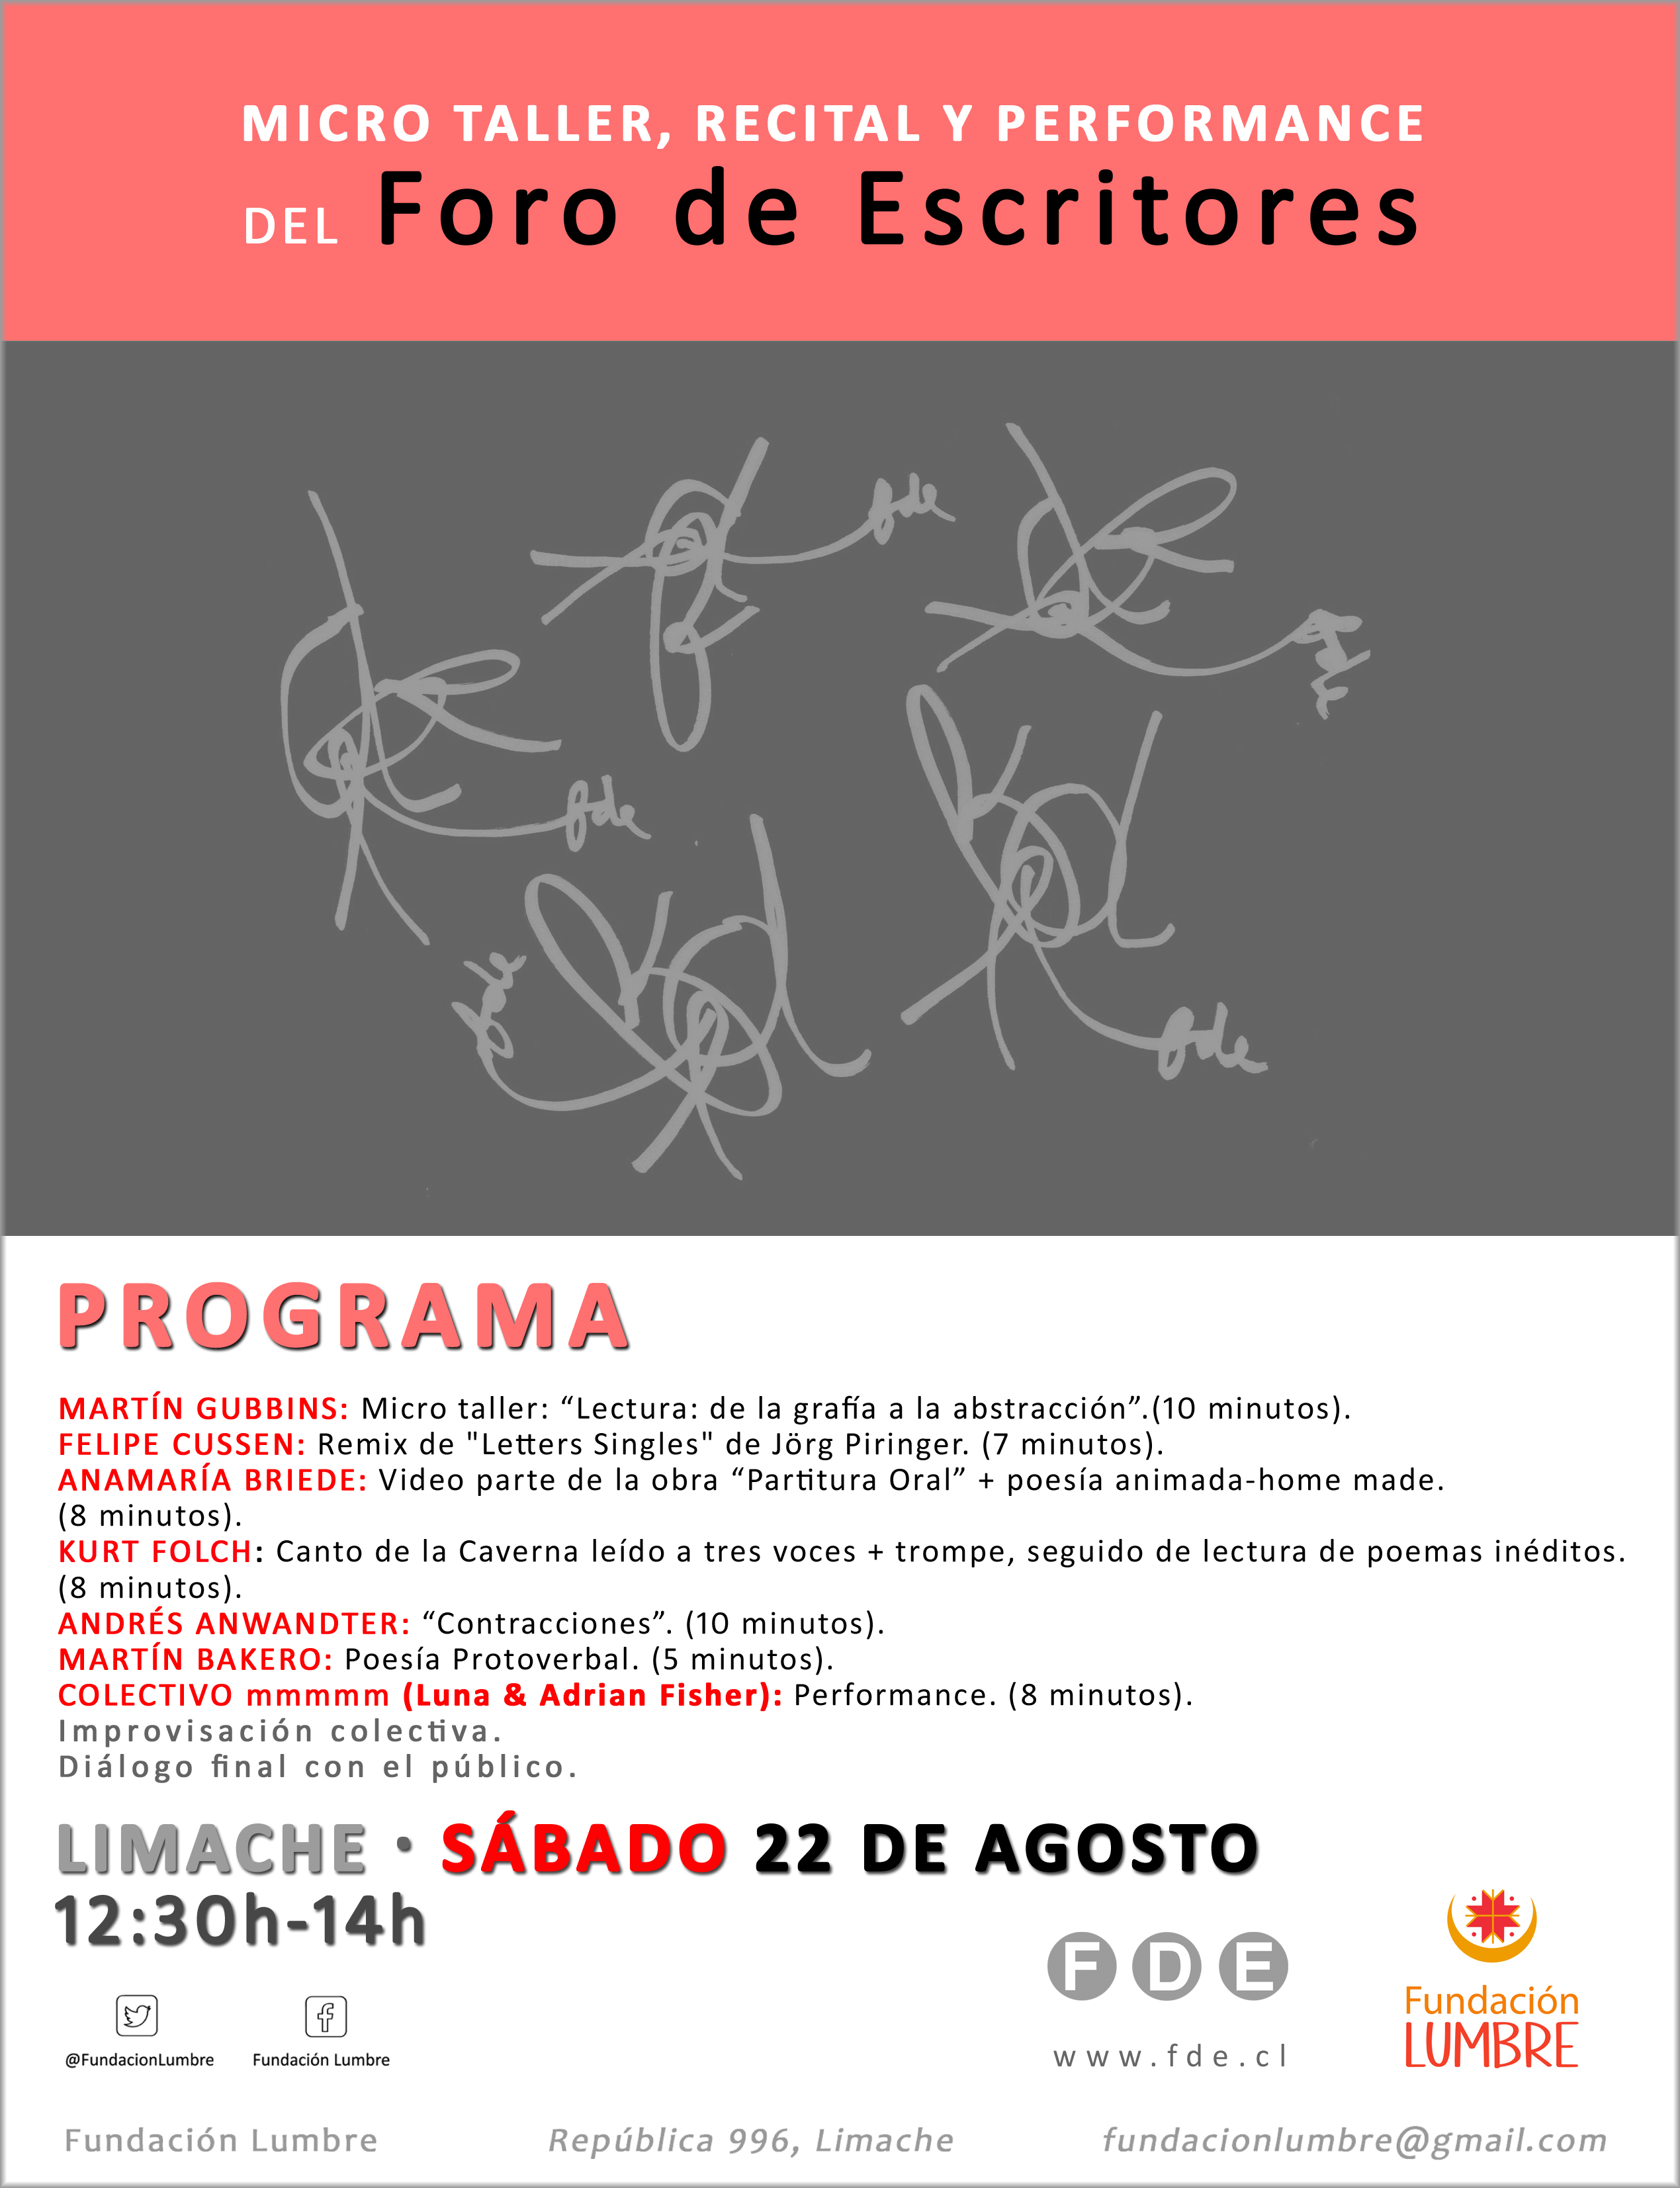 Invitacion recital FDE-FundacionLumbre-Limache-Sab22Ago2015 1230h